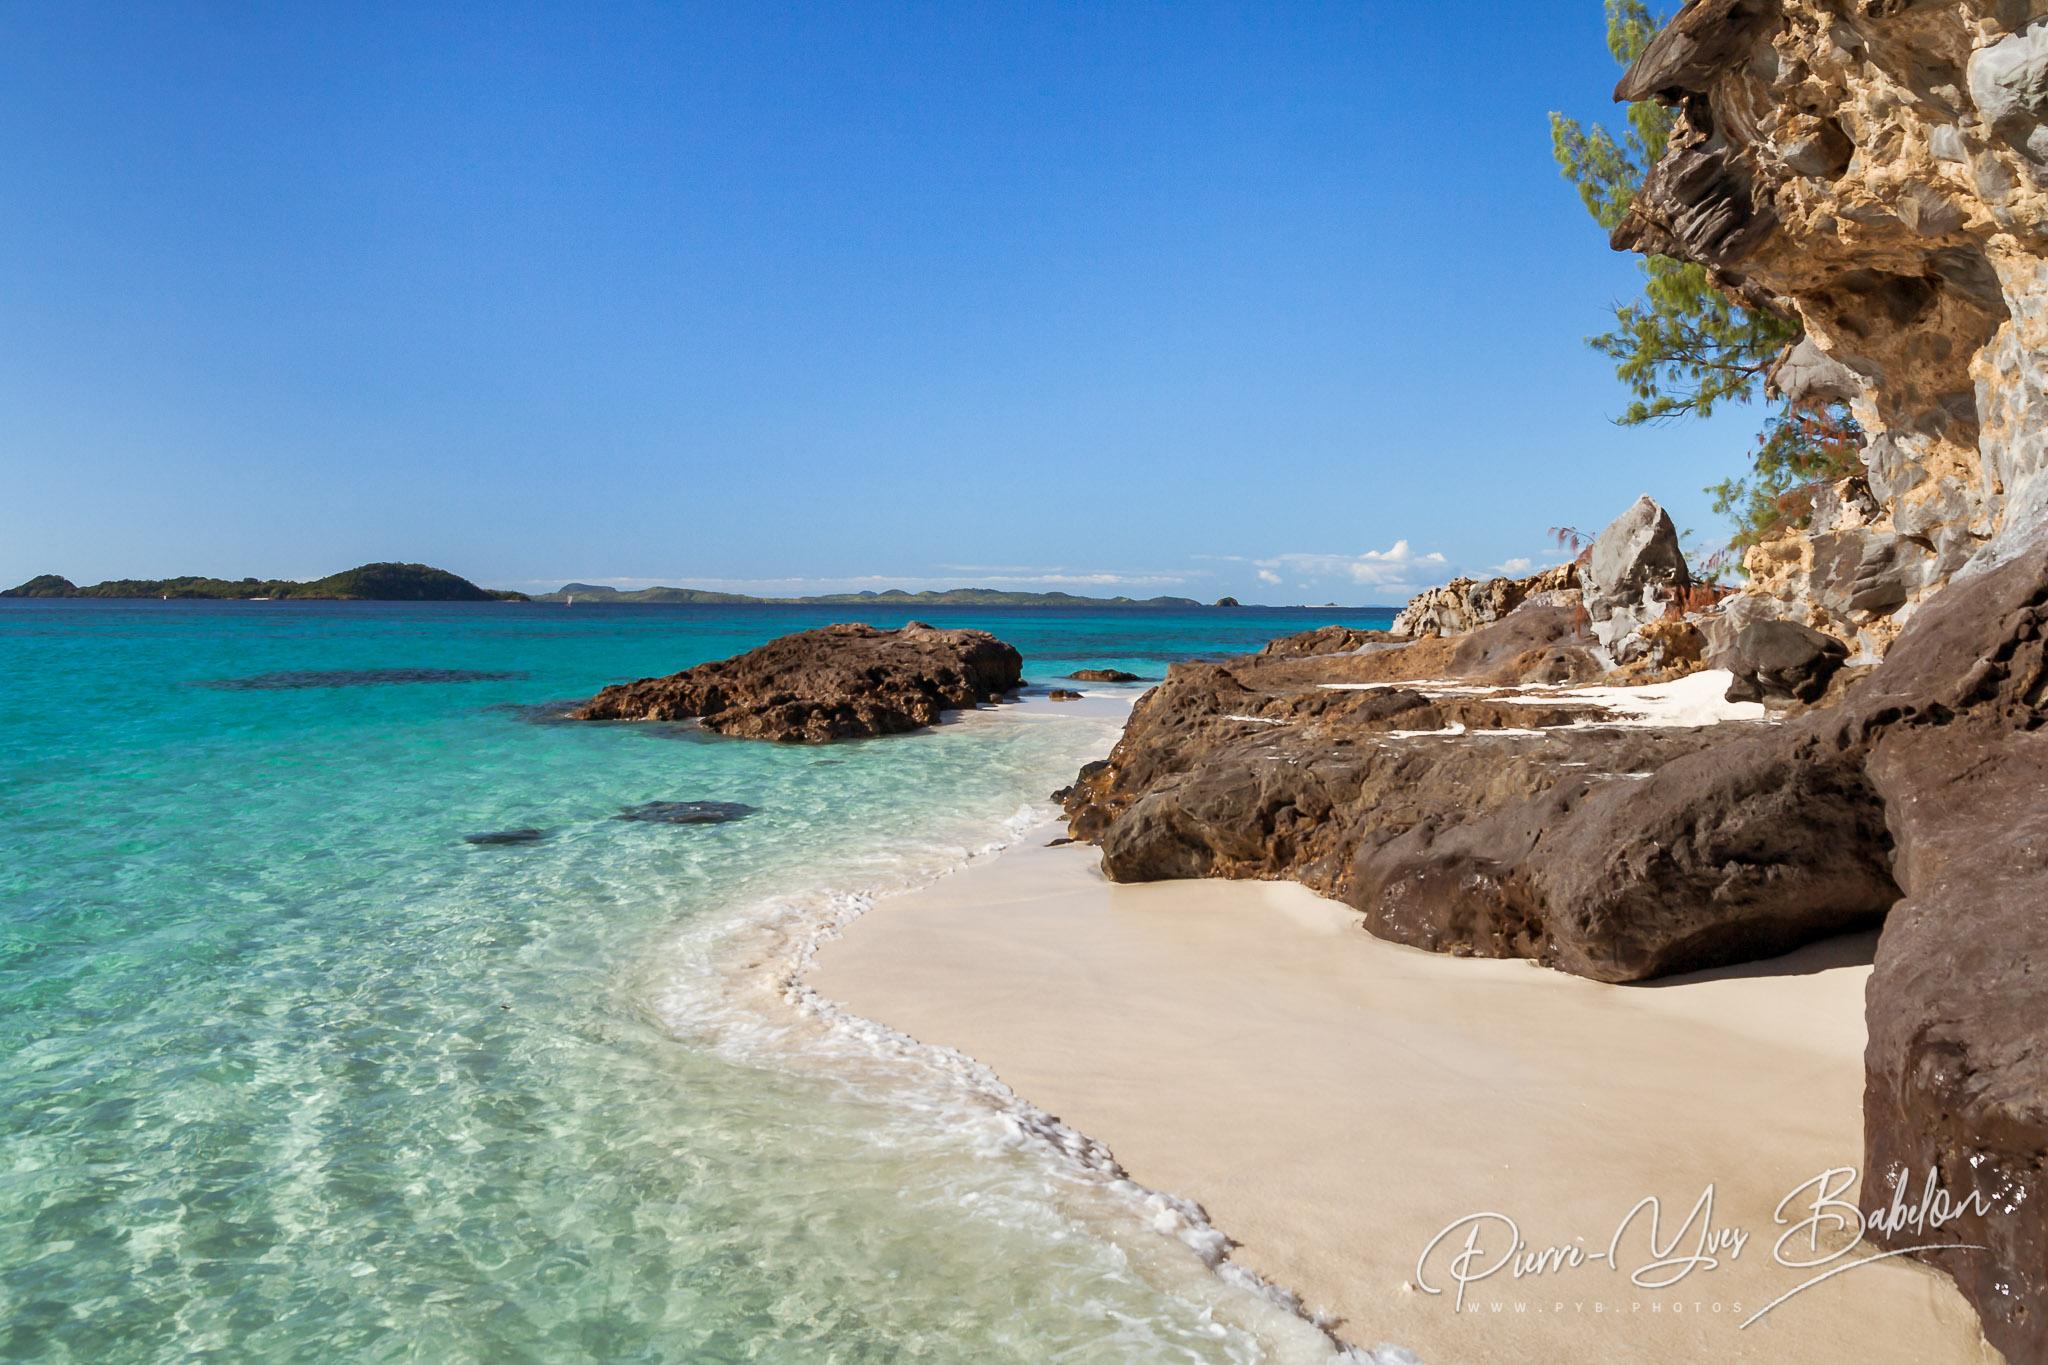 Small rocky beach